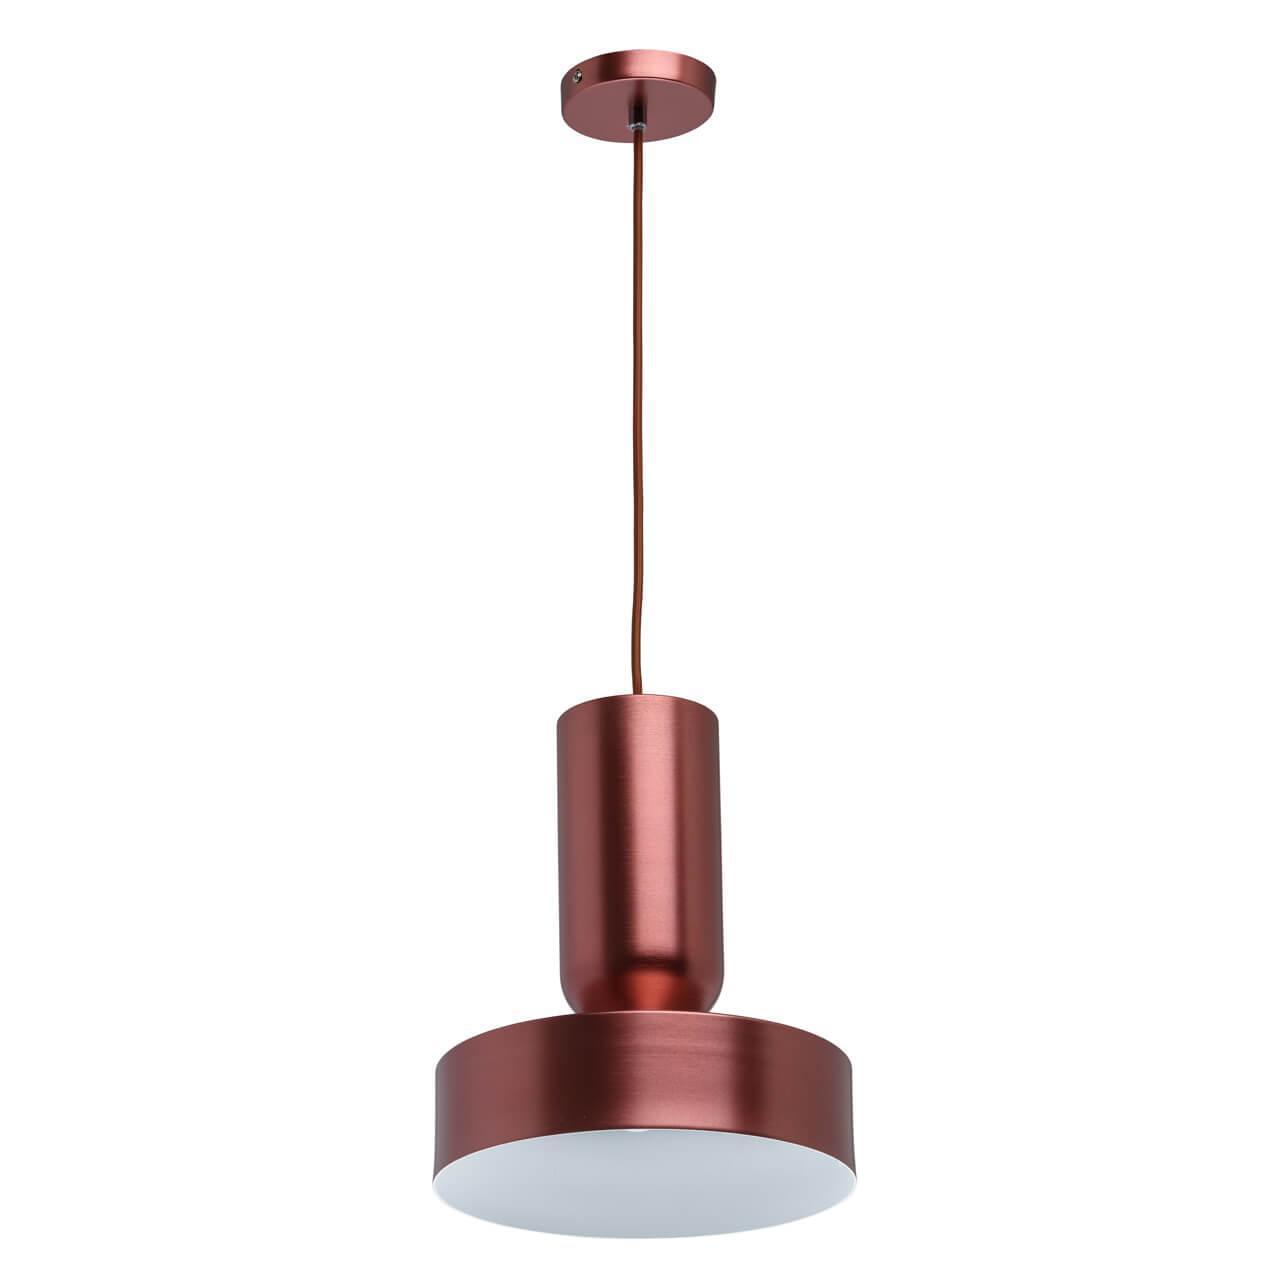 Подвесной светильник MW-Light Элвис 2 715010601 подвесной светильник mw light сандра 811010301 page 2